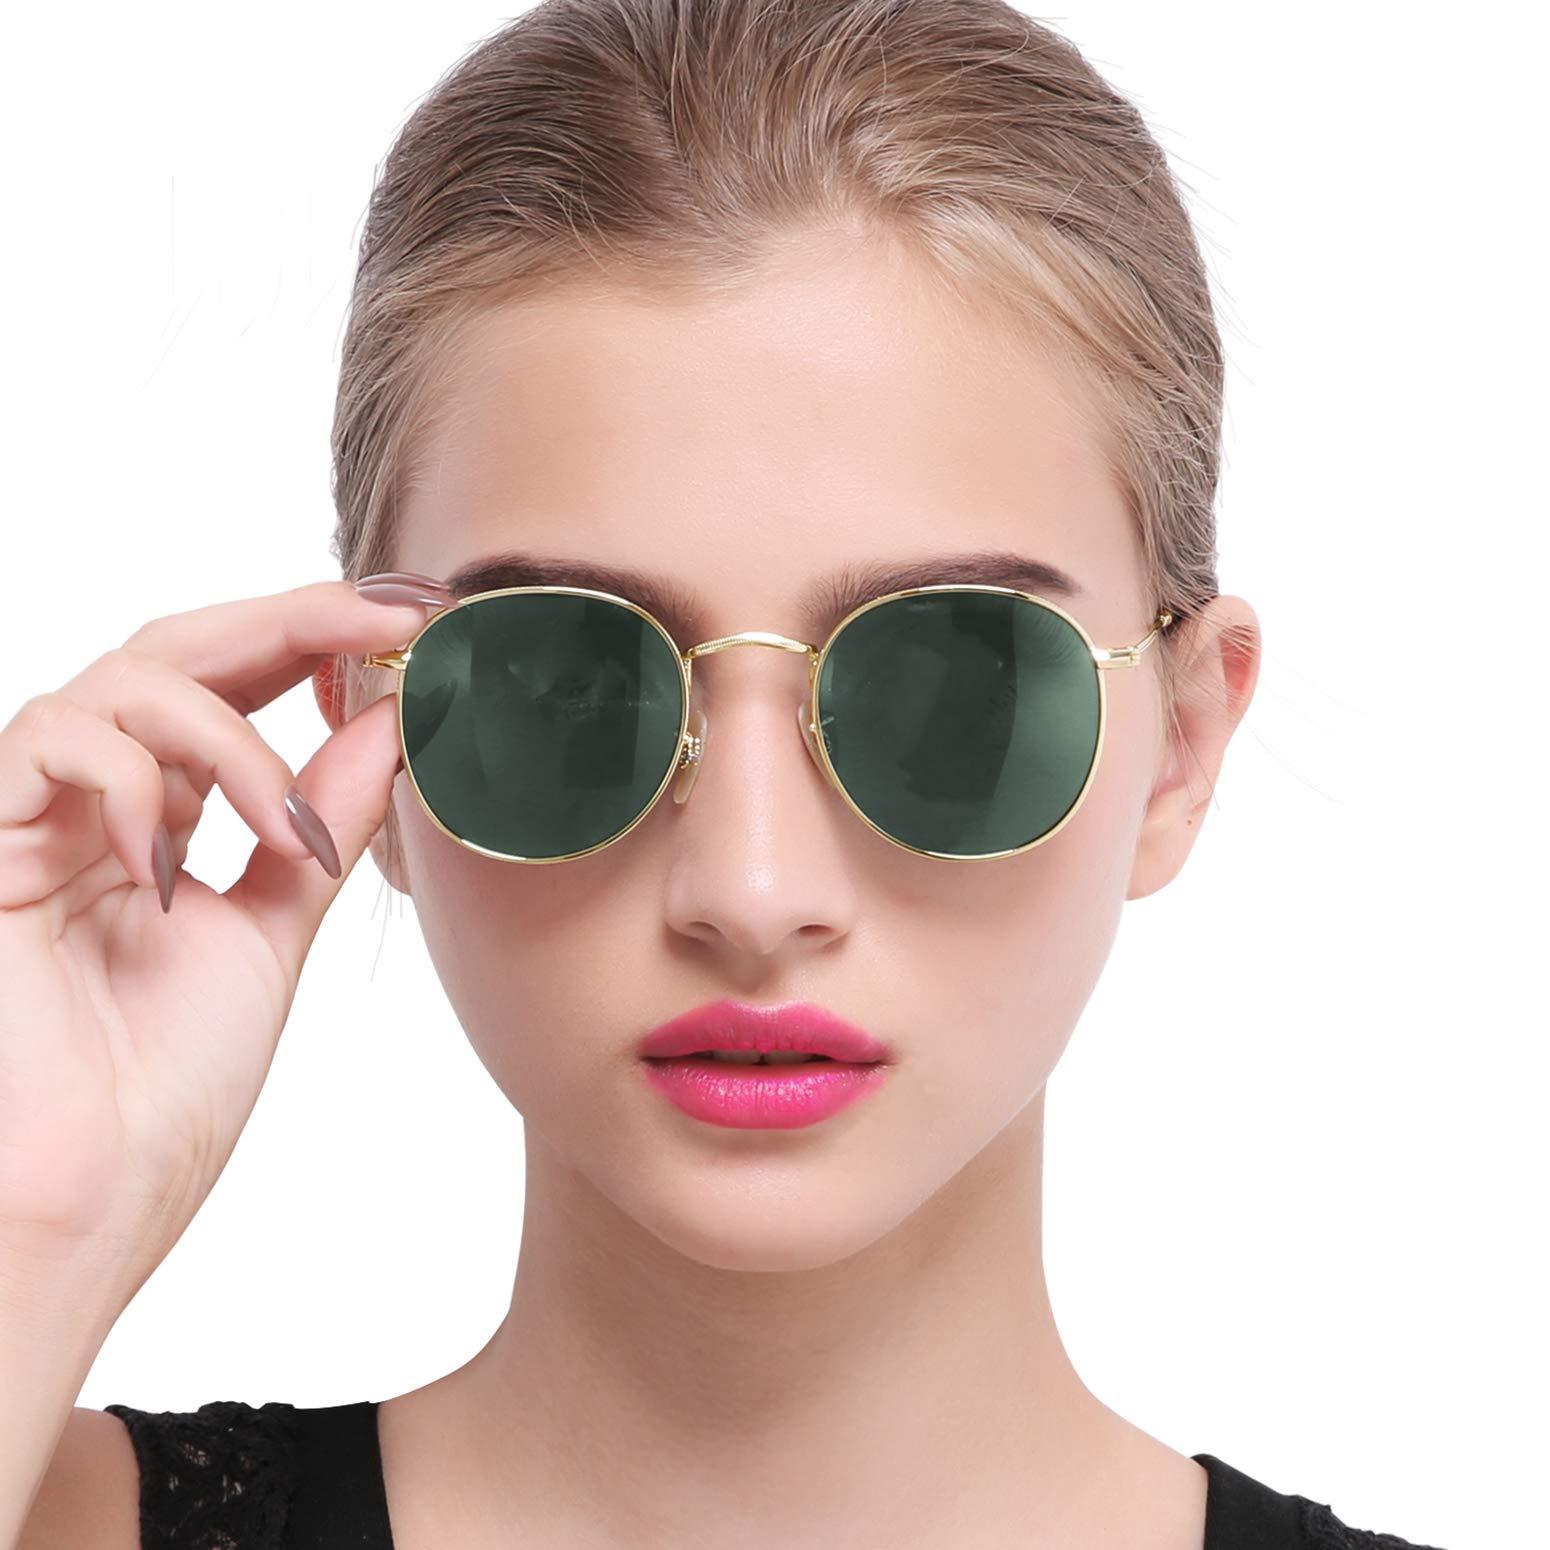 Joopin Vintage Round Sunglasses for Women Retro Brand Polarized Sun Glasses E3447 (Dark Green) by Joopin